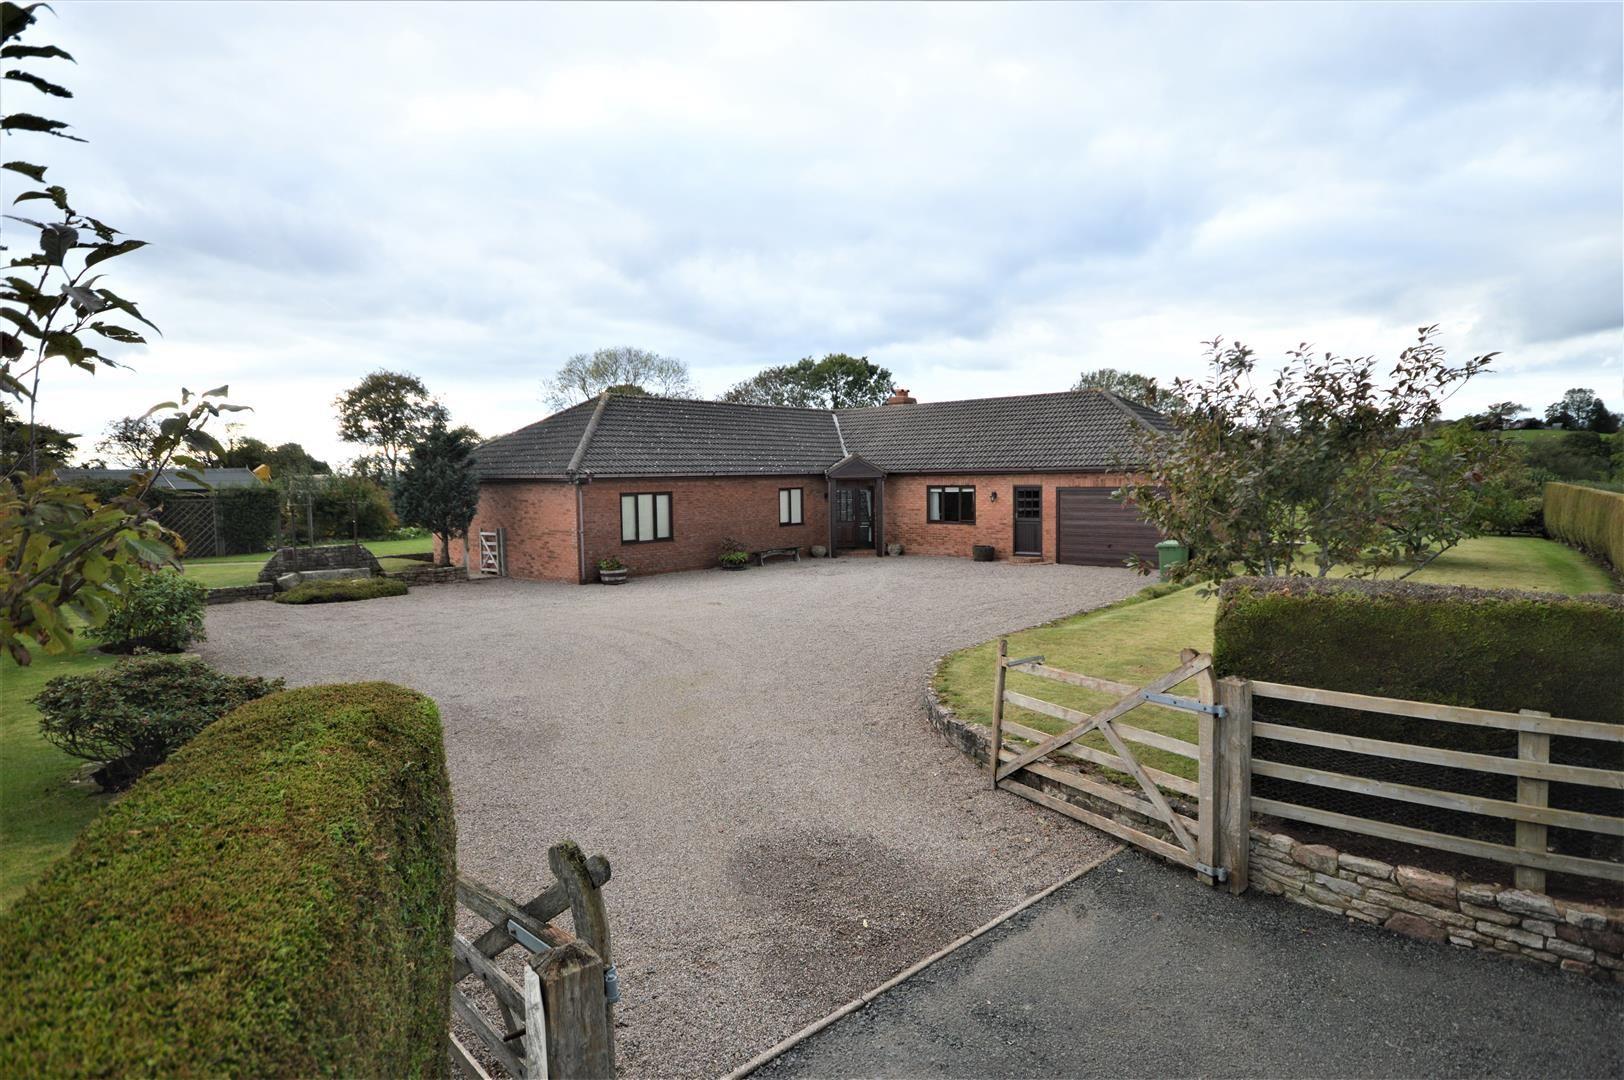 4 bed detached-bungalow for sale in Little Cowarne, HR7